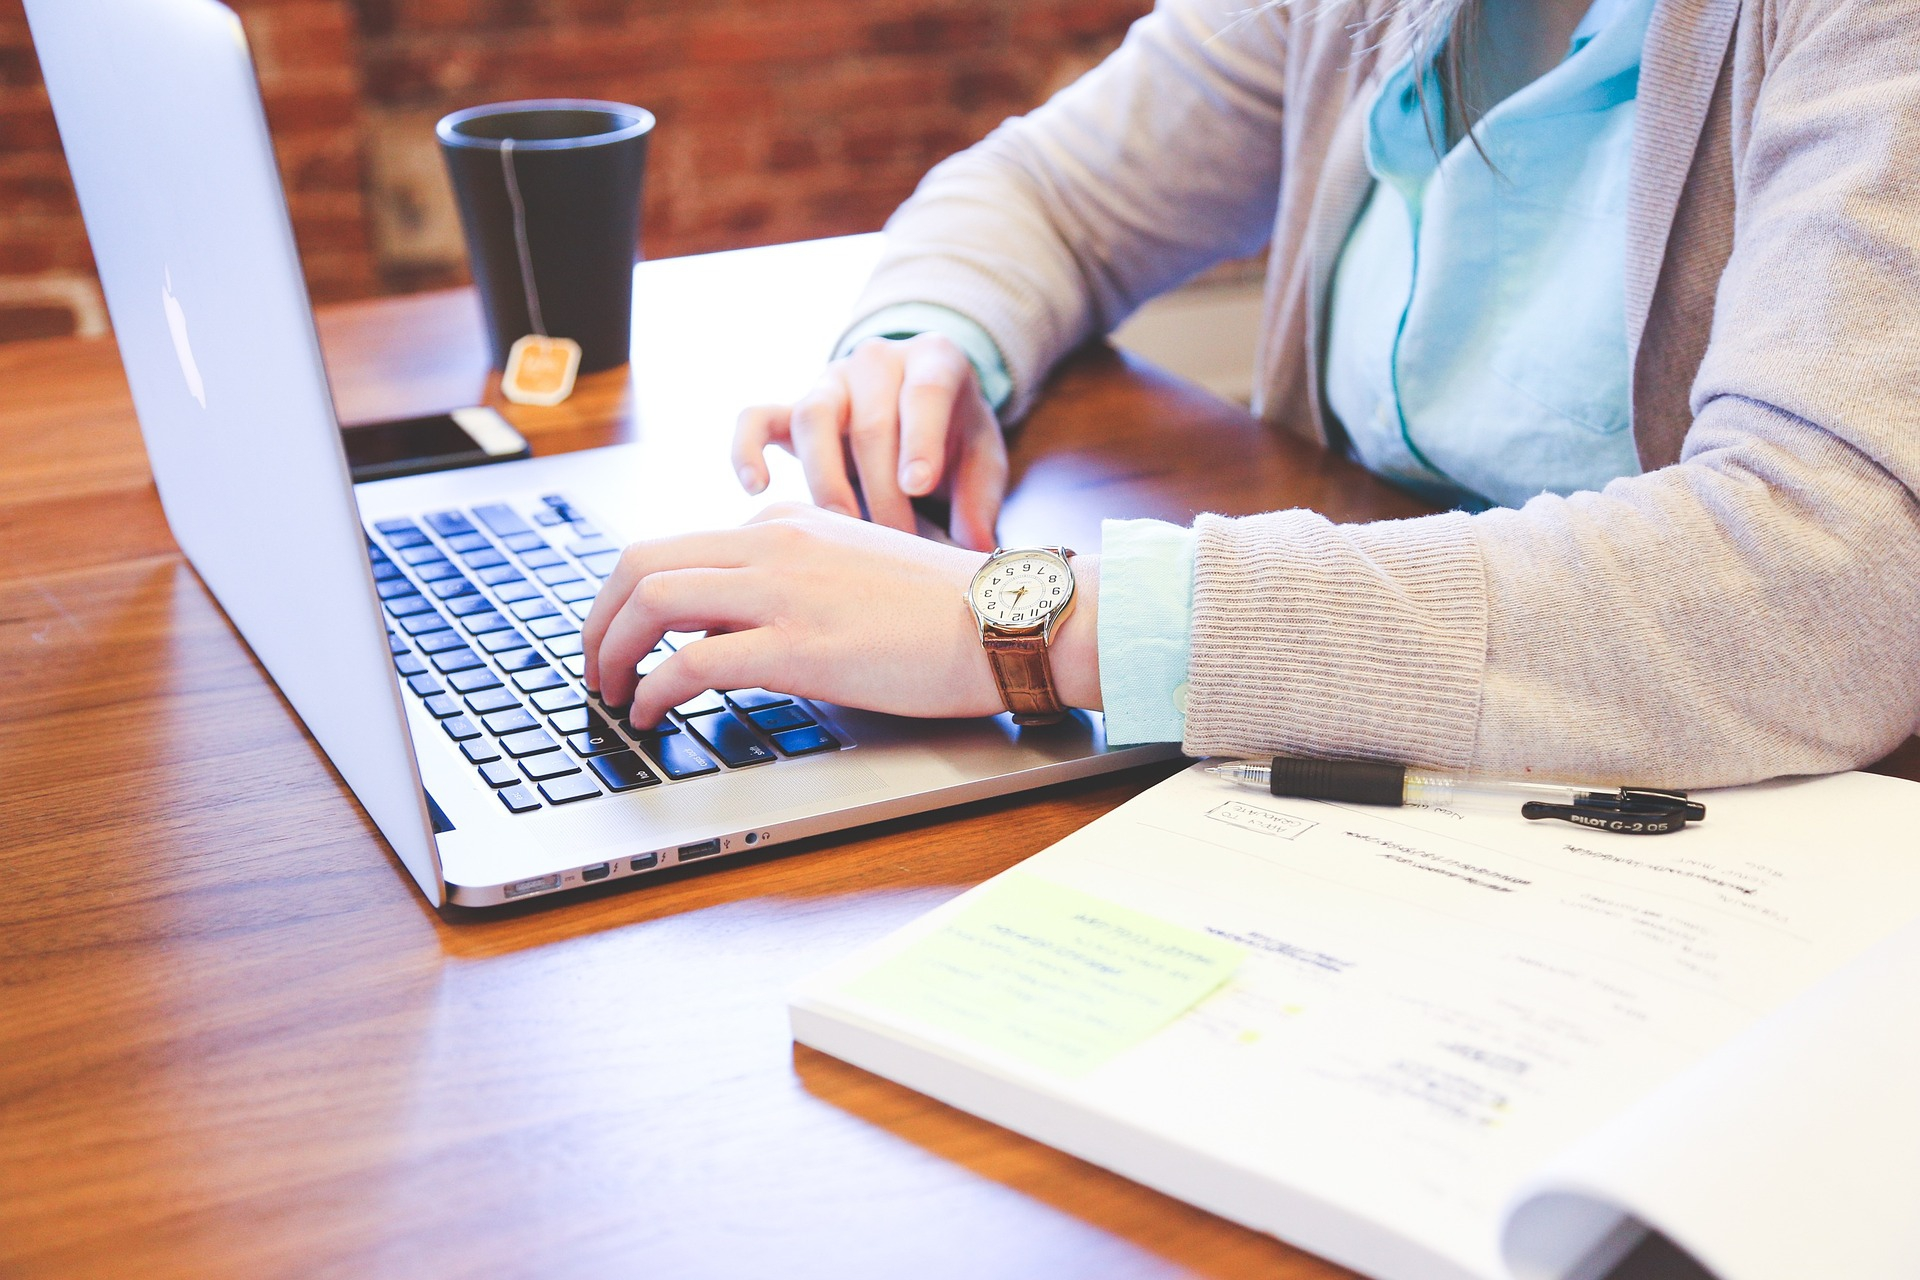 Google Україна запускає Digital Академію для жінок